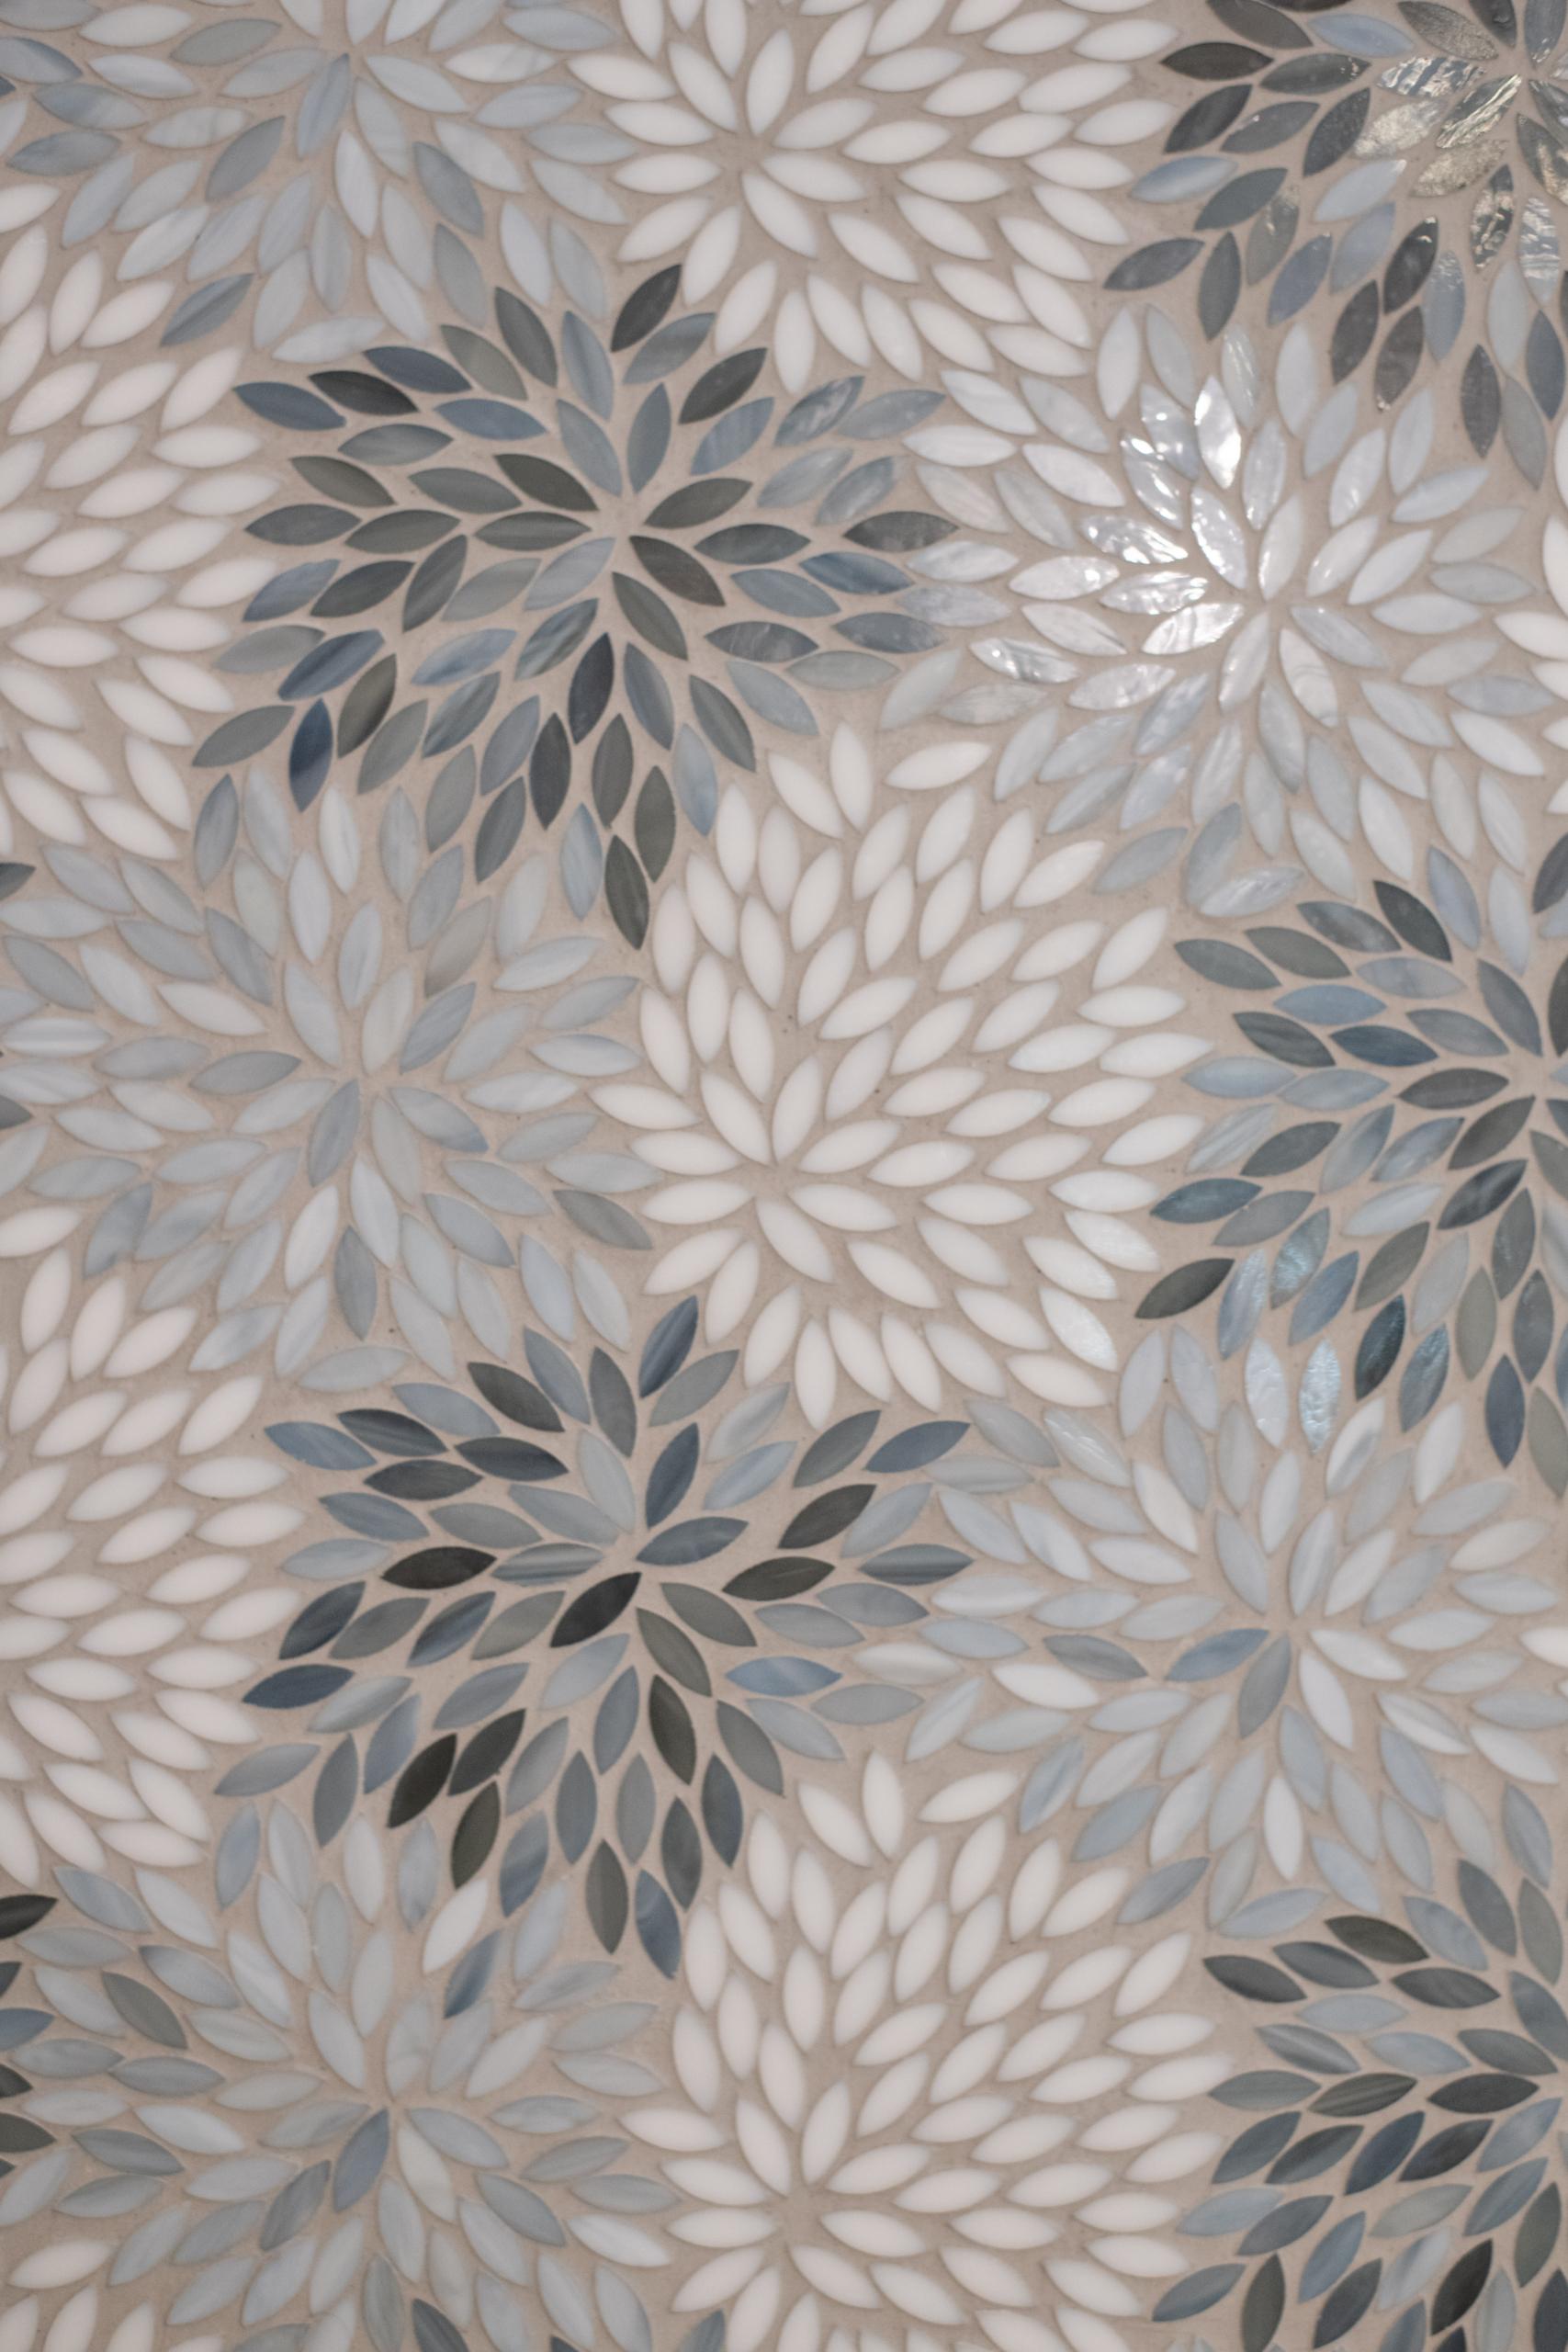 floral mosaic tile with light blue and dark blue color range